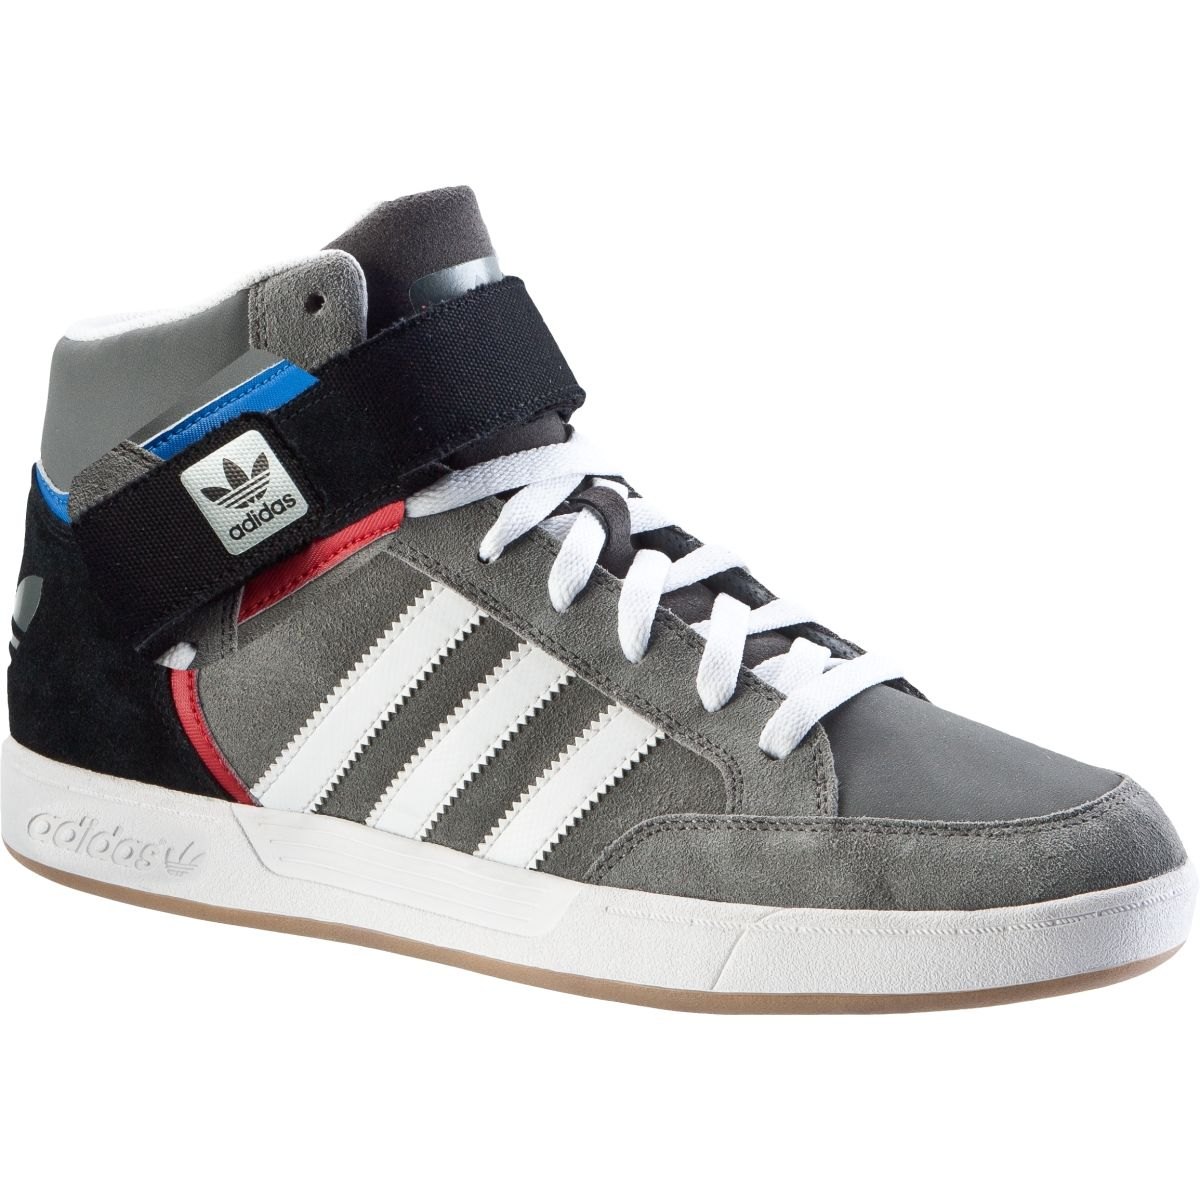 Adidas Varial Mid 3